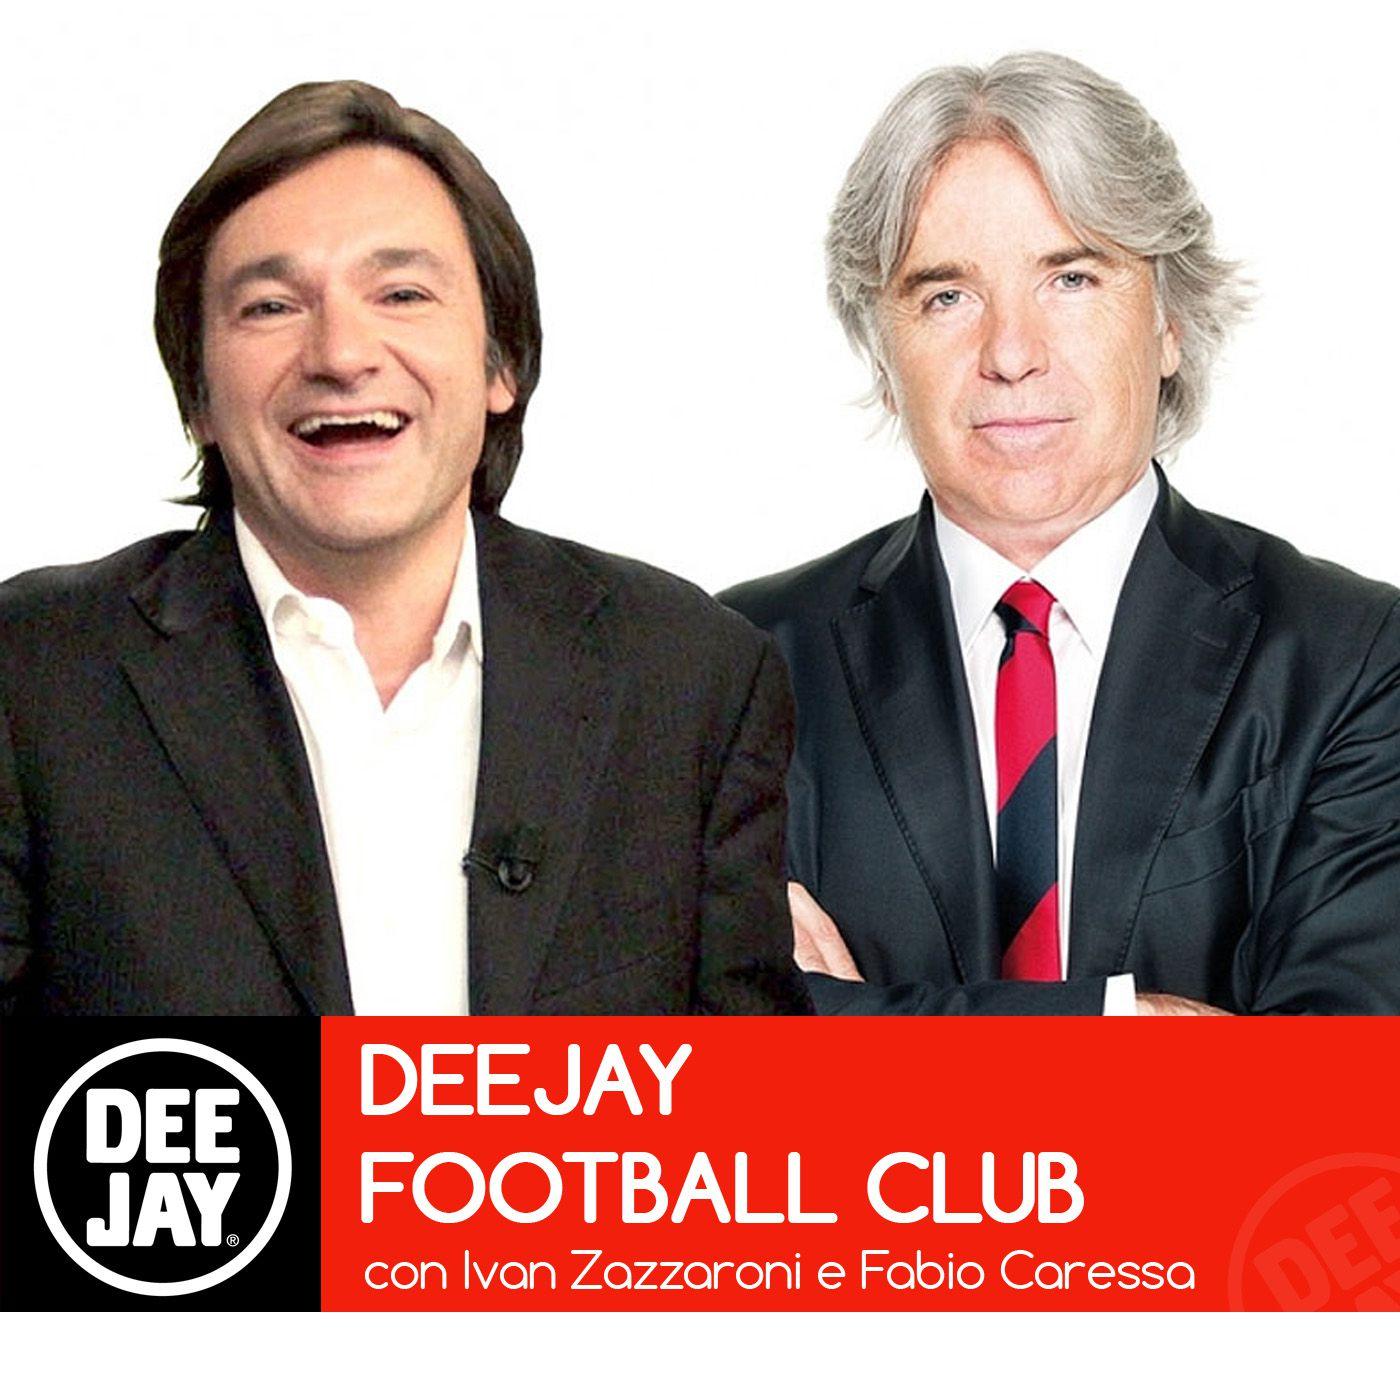 Deejay Football Club